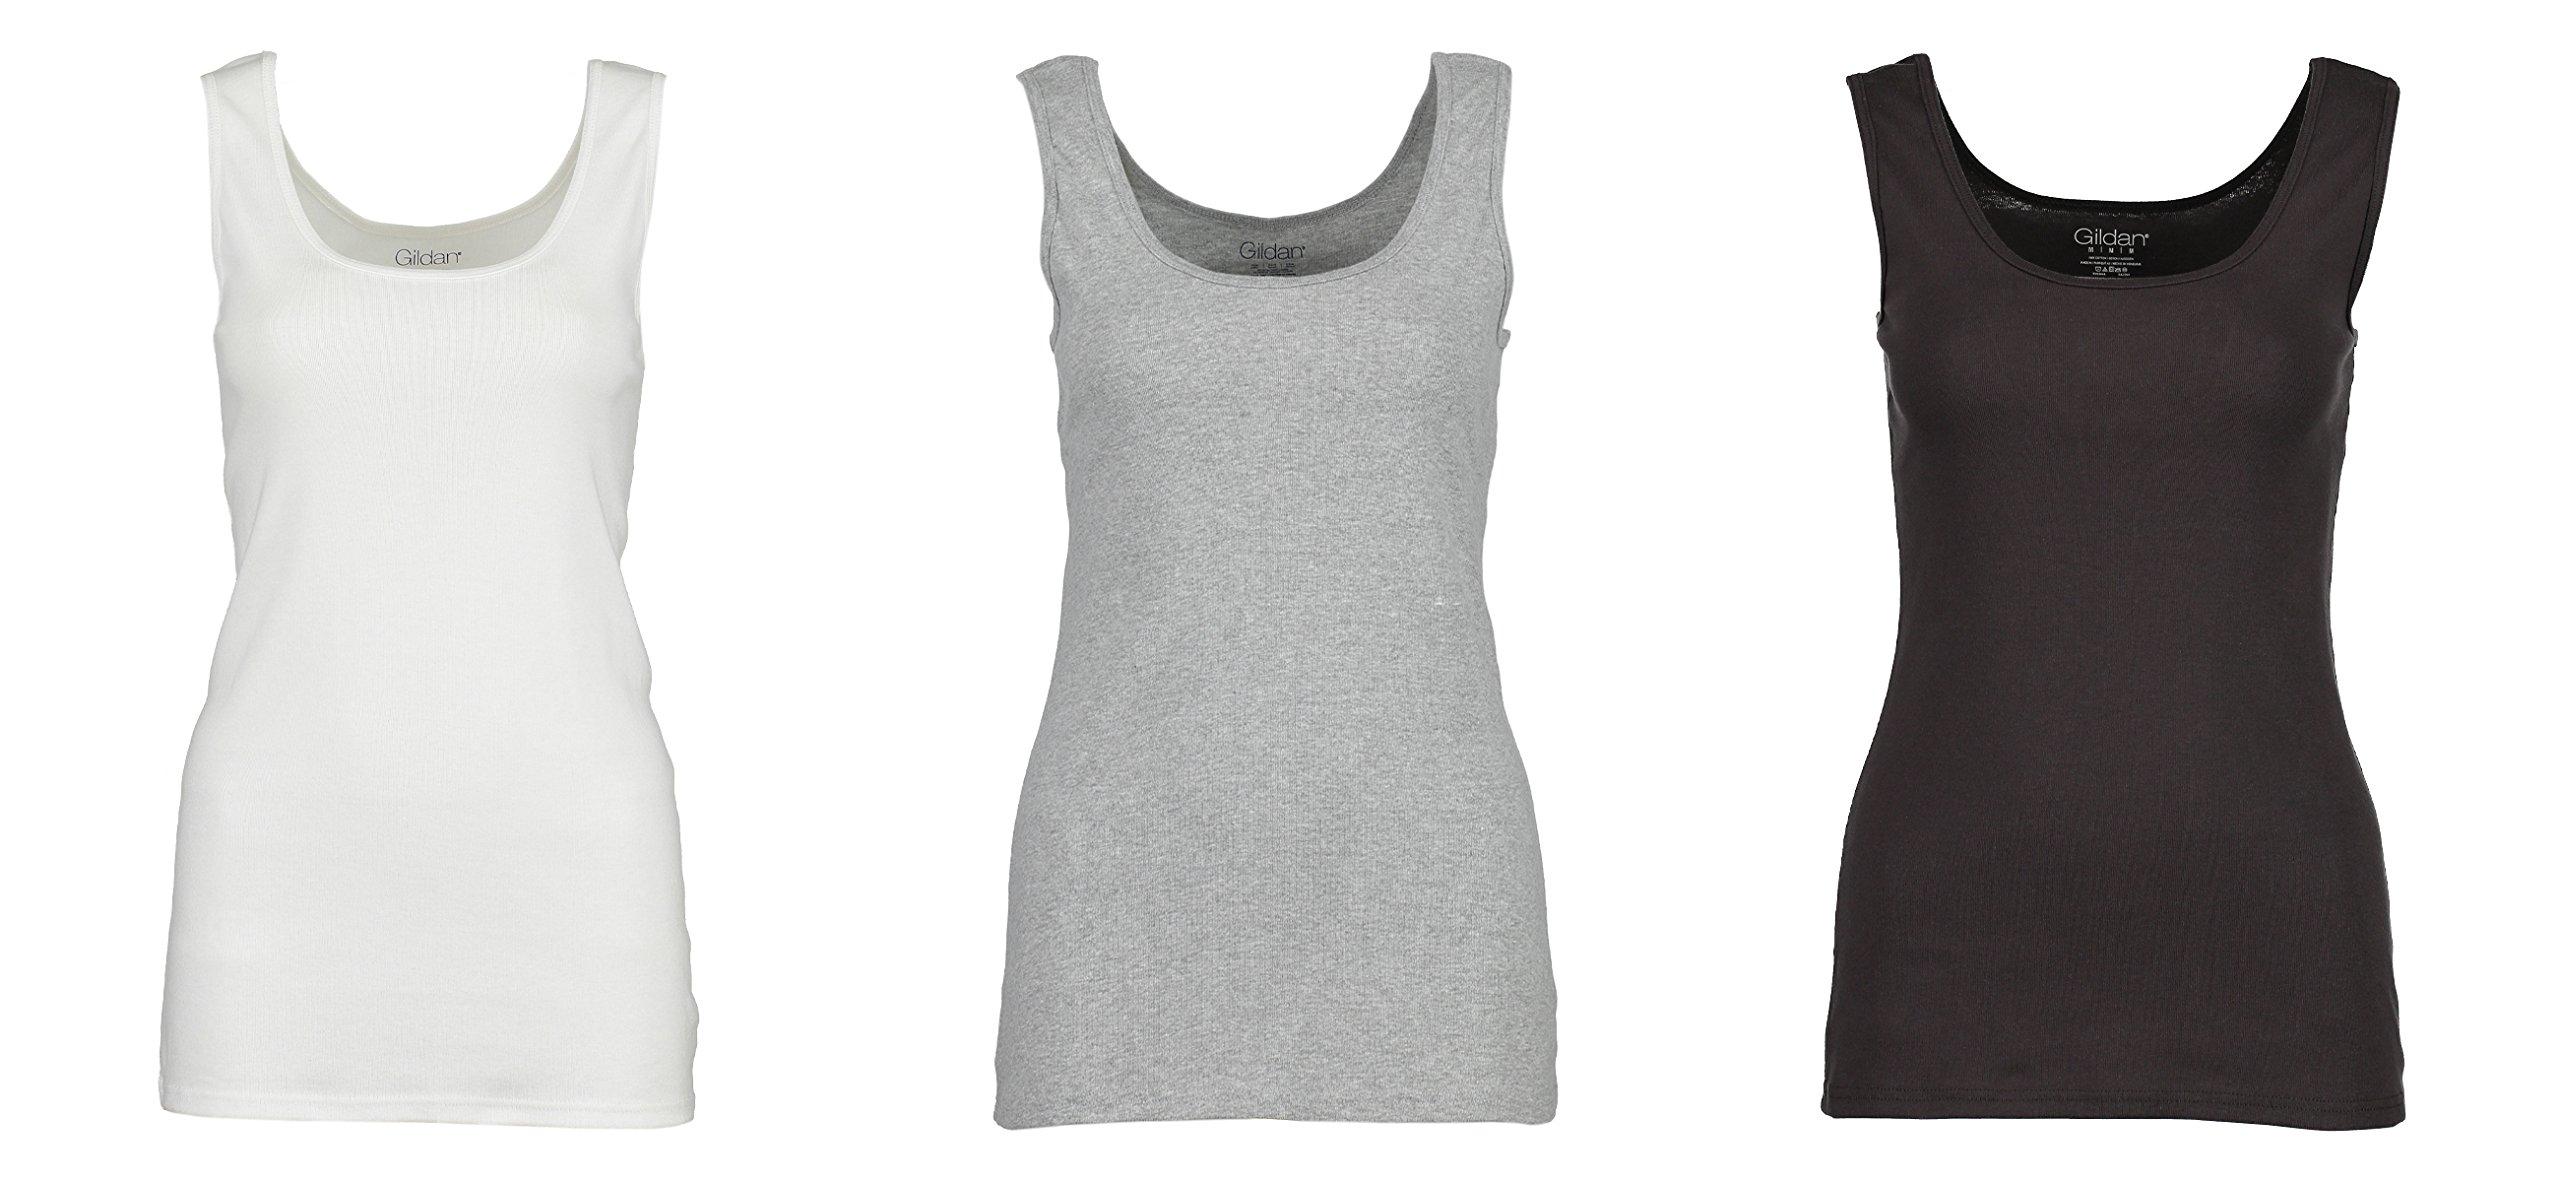 3-Pack Gildan Women's Tank Tops, 100% Cotton Ribbed Ladies Layering Gym Tank Top Shirts (White, Grey, Smoke, Small)